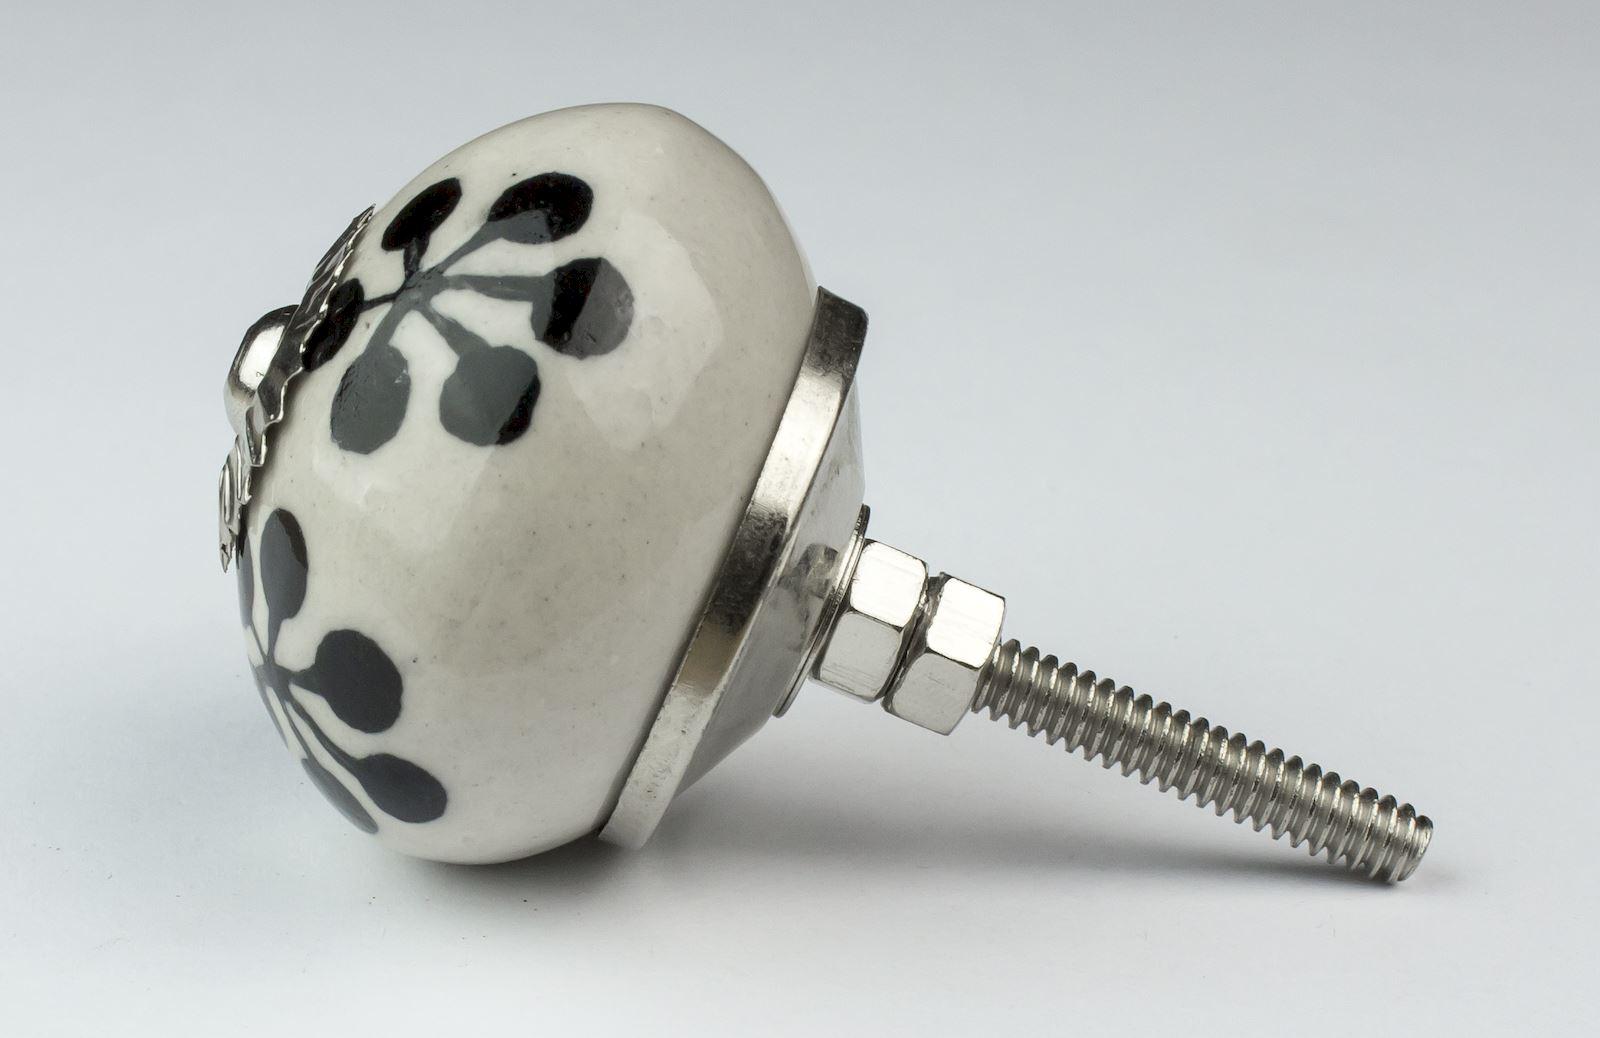 Vintage-Mix-and-Match-Ceramic-Door-Knobs-Handles-Furniture-Drawer-Pulls-Cupboard miniatura 41